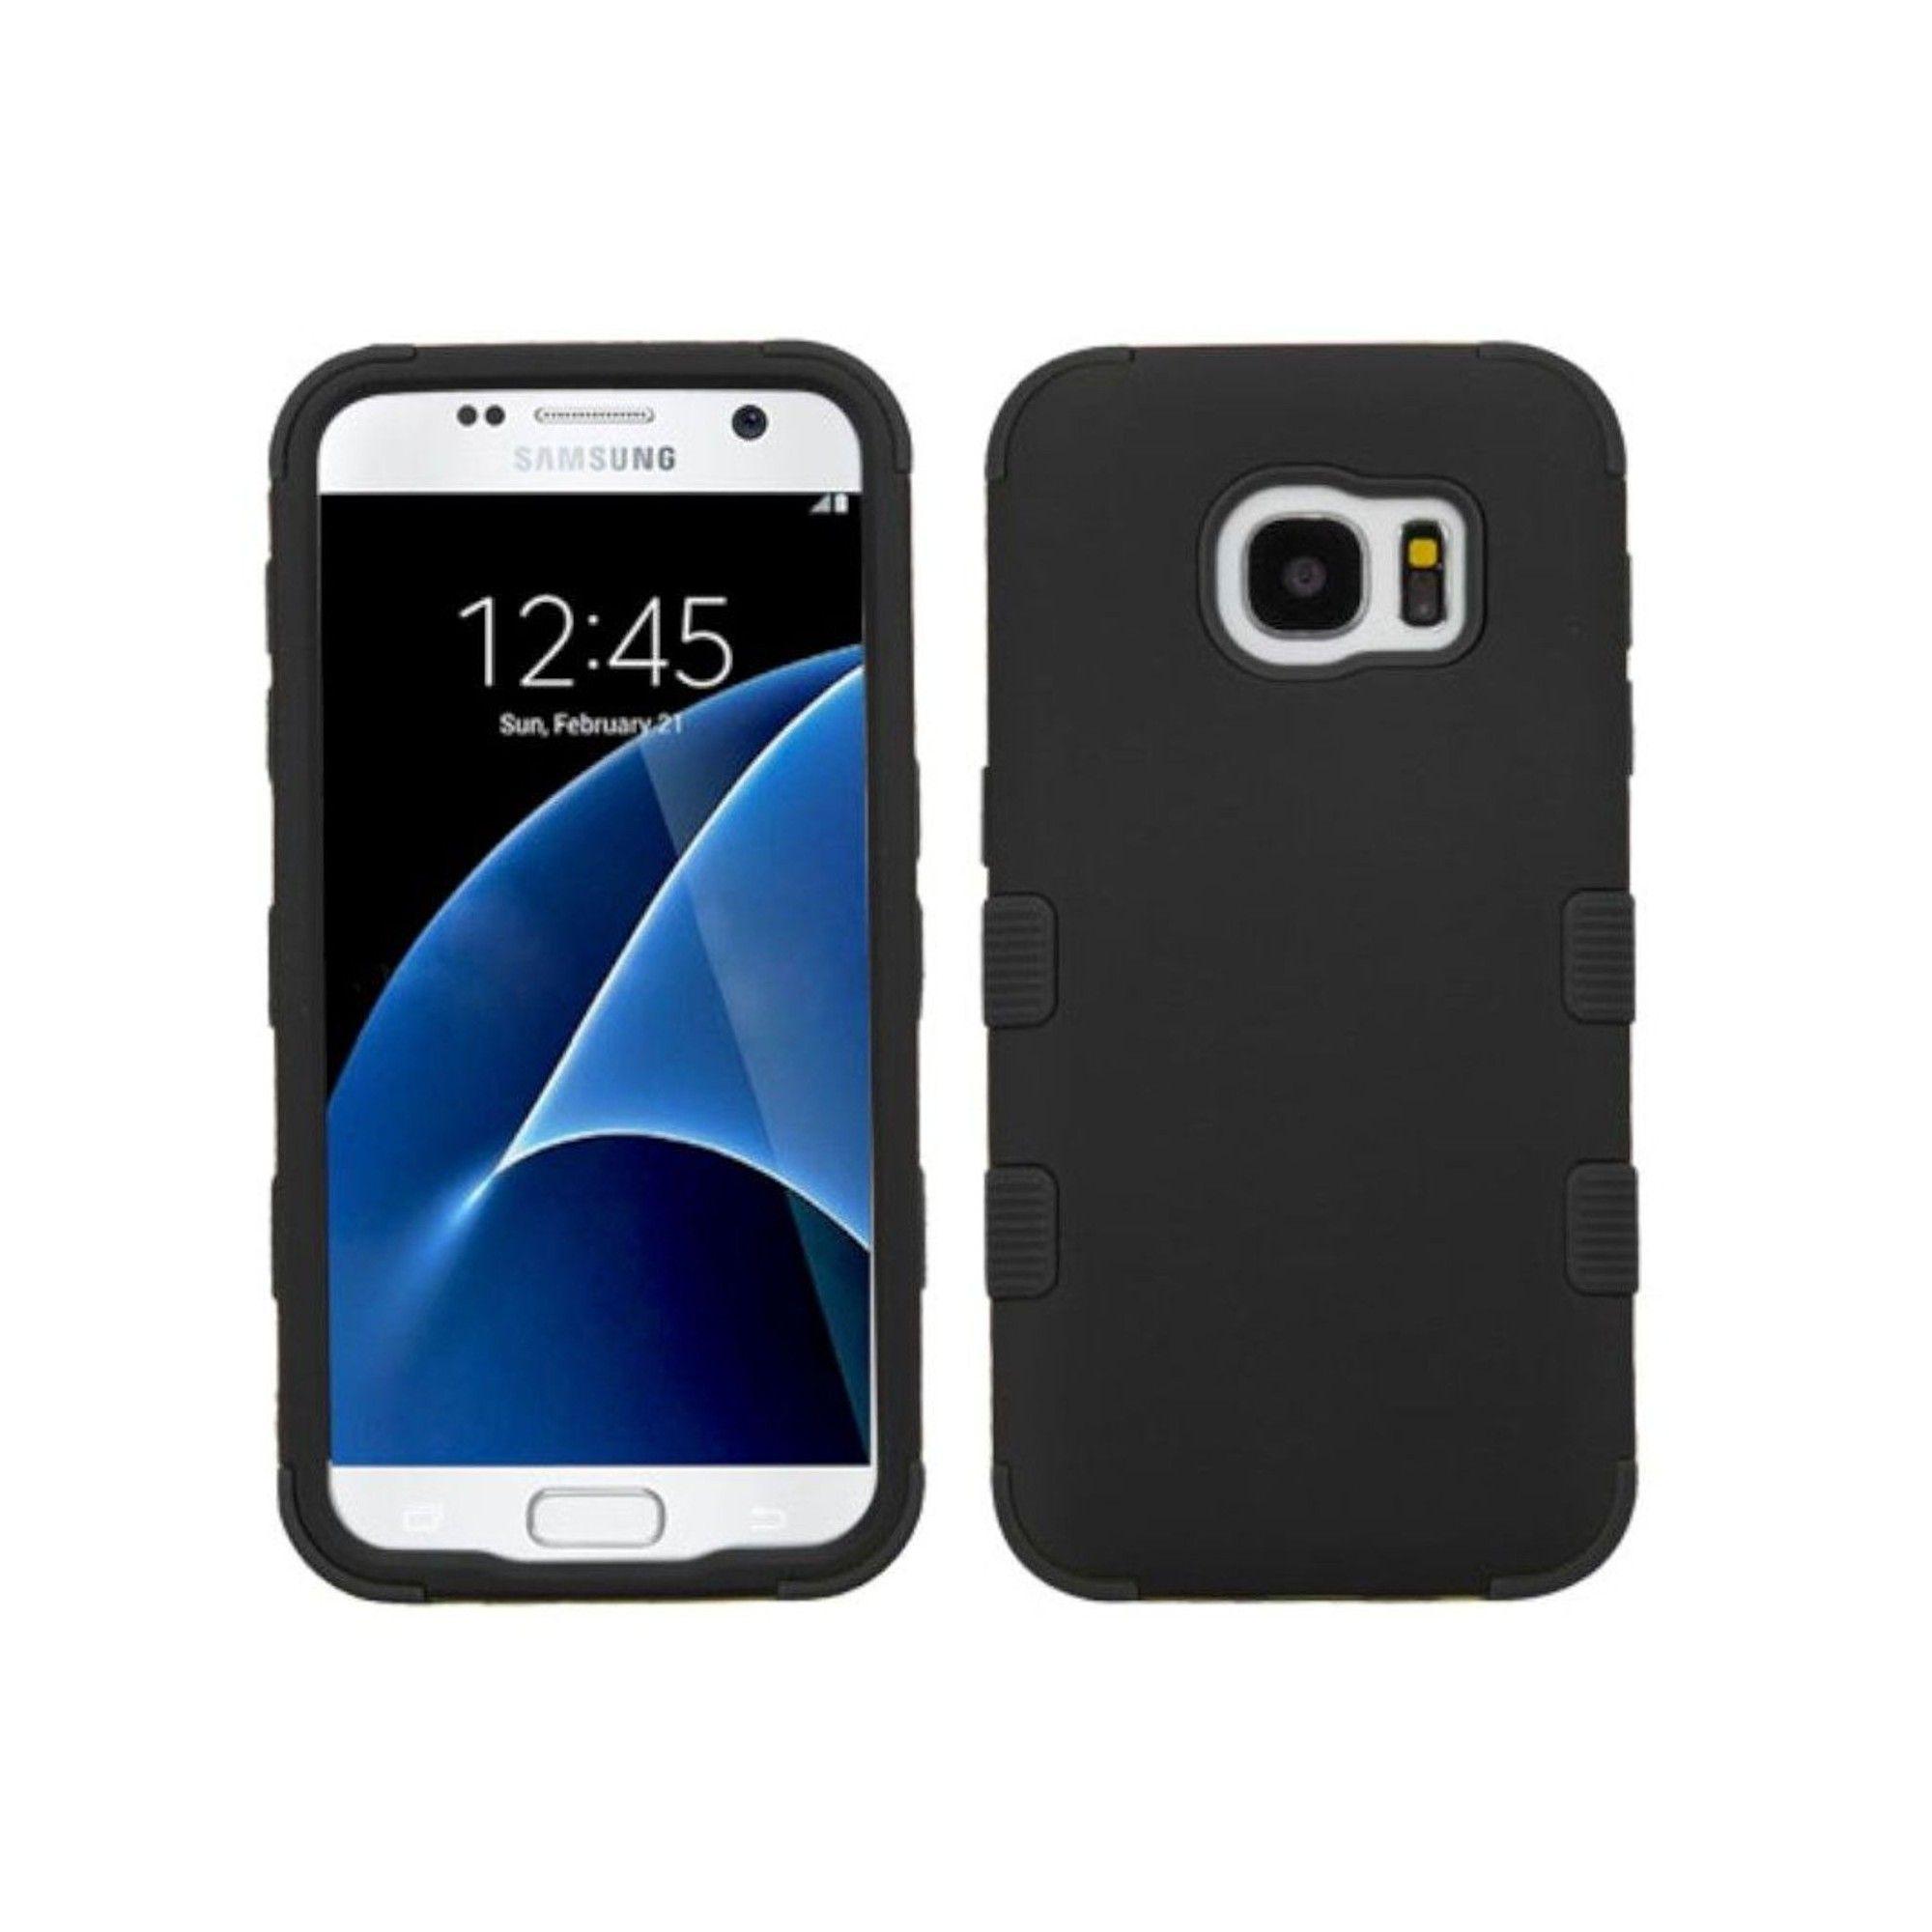 MYBAT For Samsung Galaxy S7 Black Tuff Hard Silicone Hybrid Rubberized Case